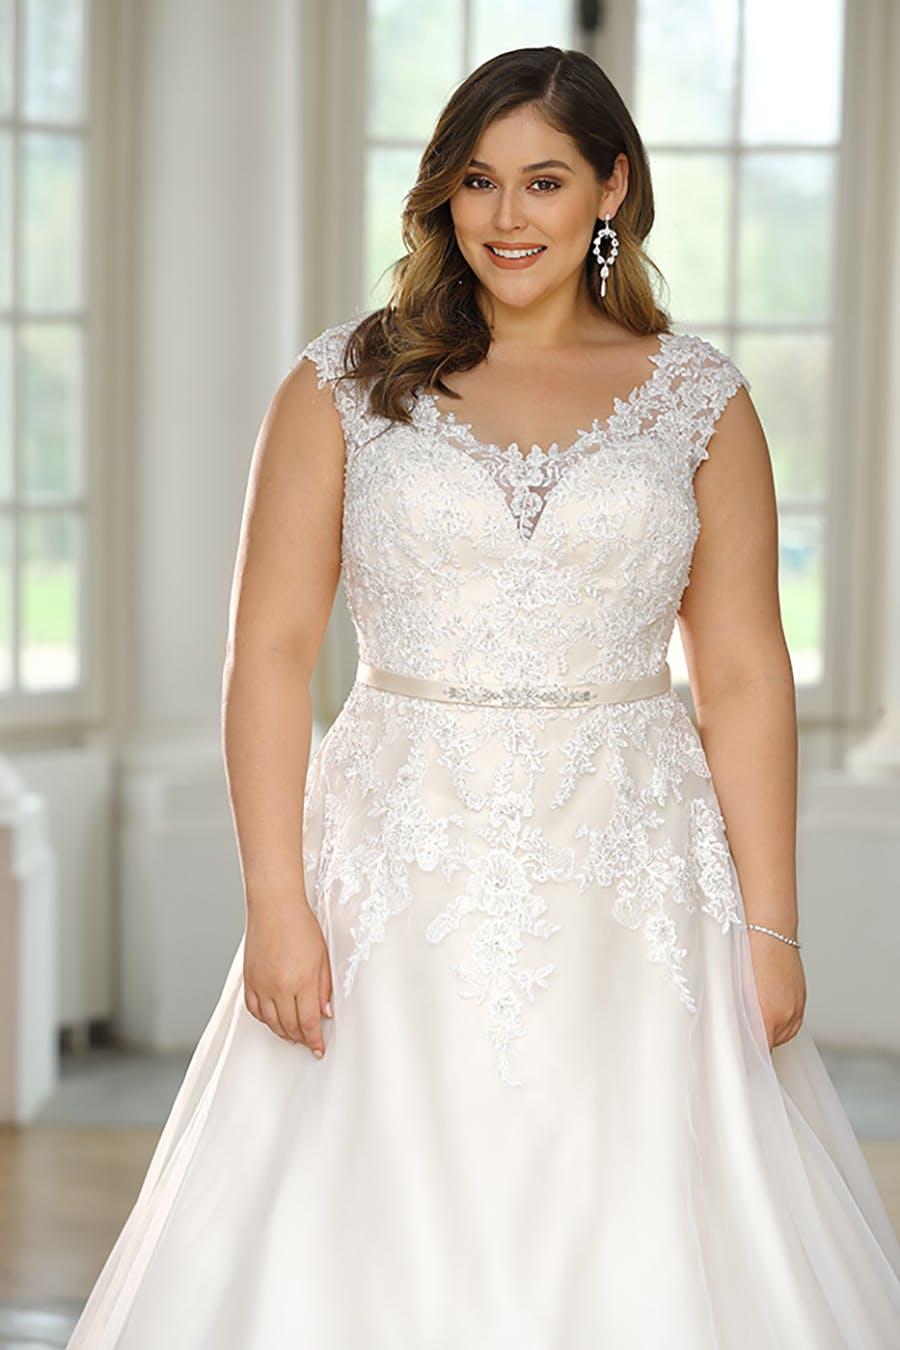 17 Amazing Wedding Dresses for Older Brides Classy